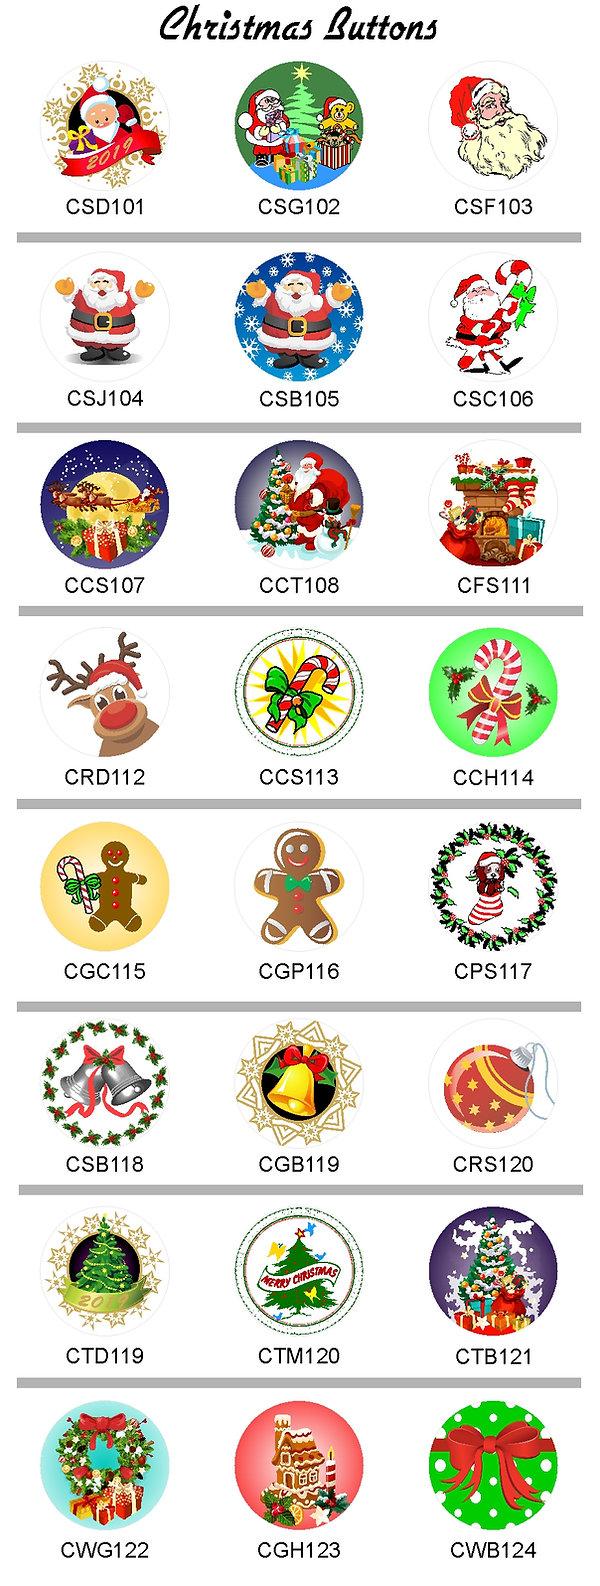 Christmas Buttons.jpg